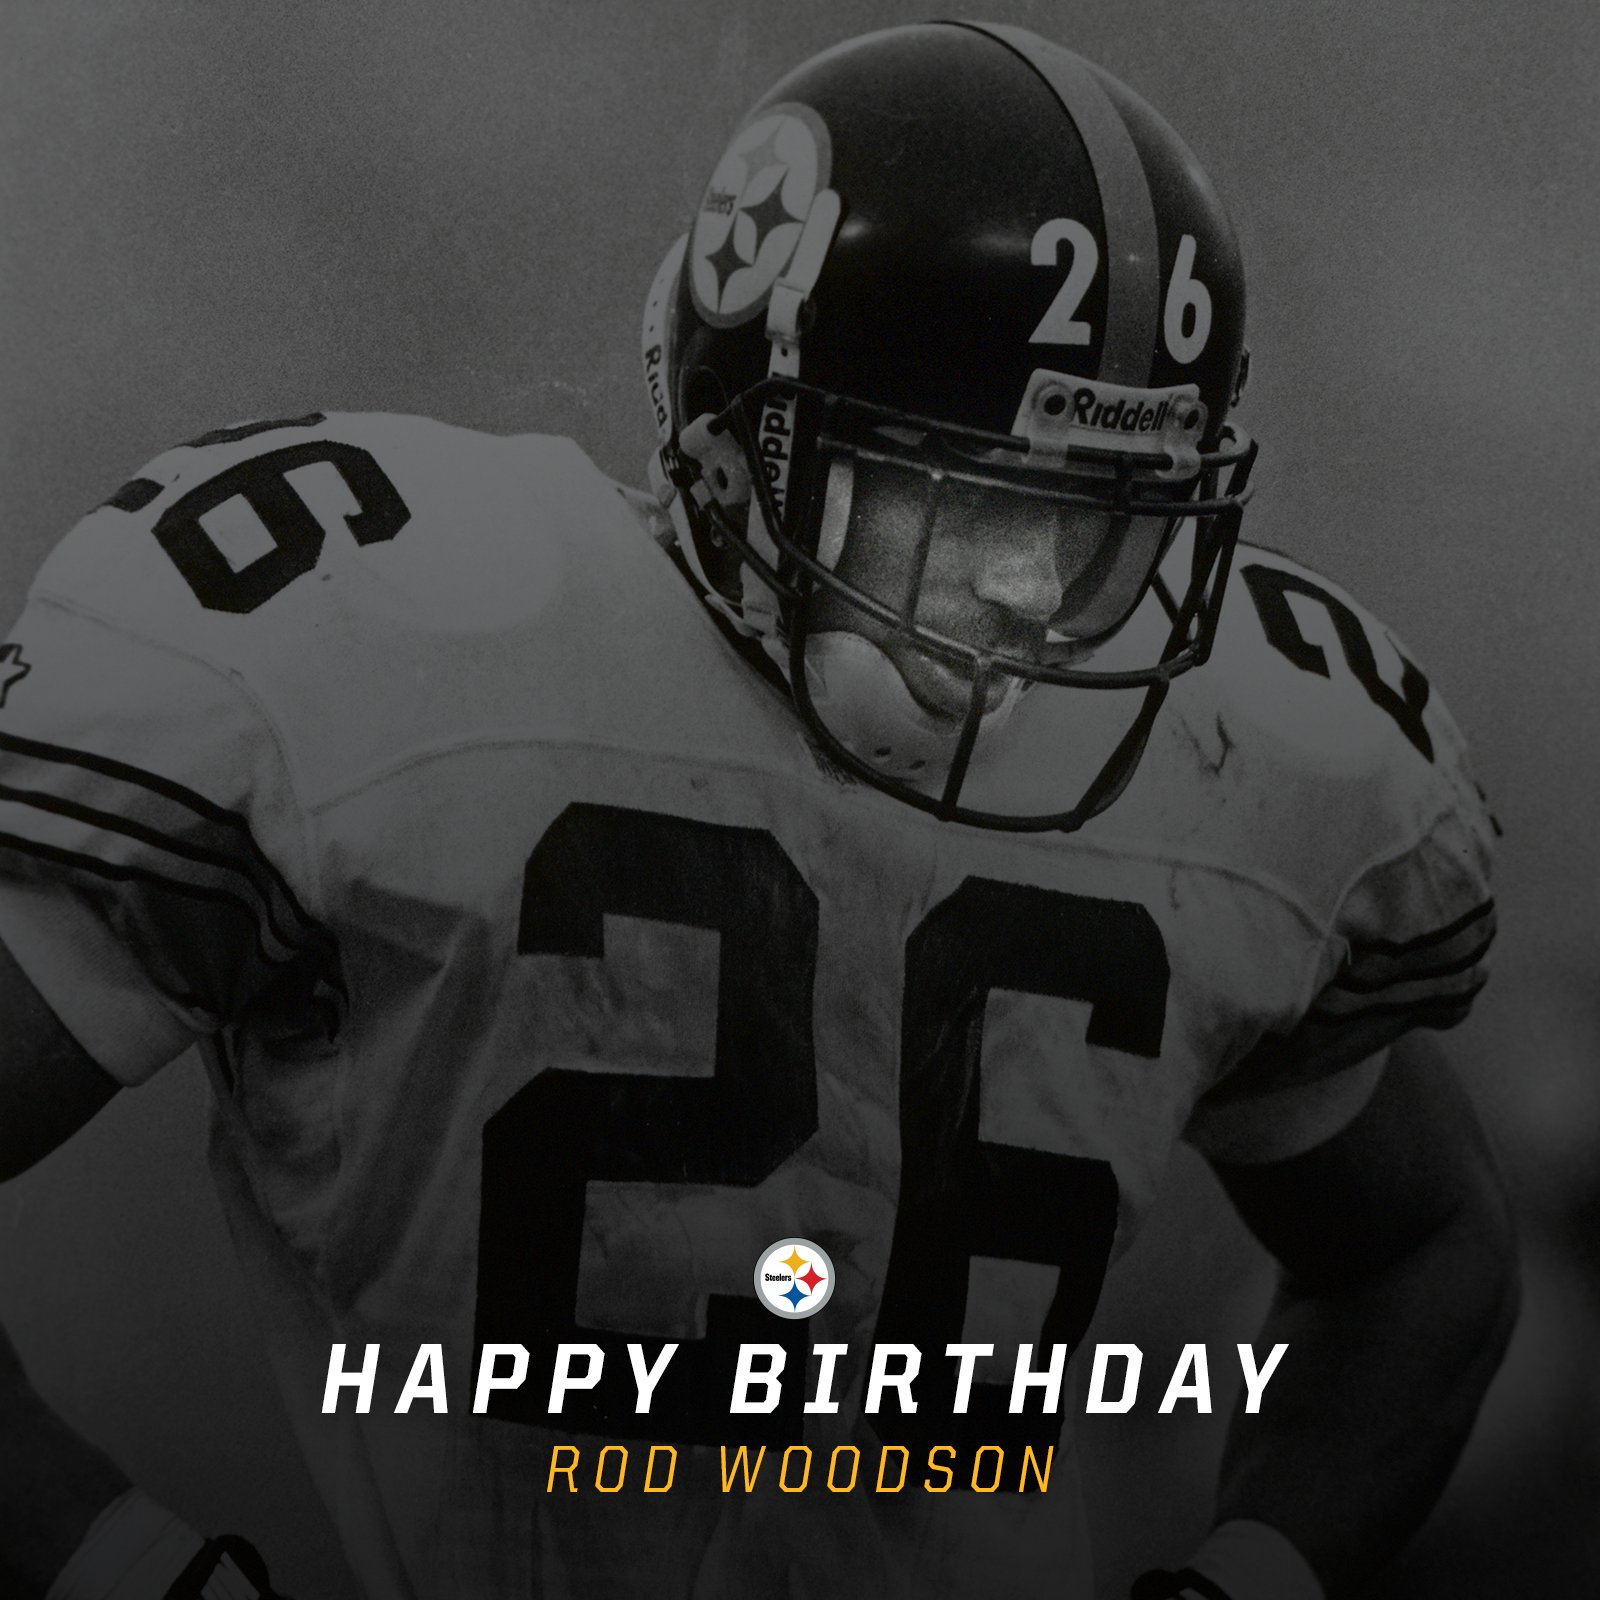 #HappyBirthday @RodWoodson26‼️ https://t.co/SbAXYYI3L7